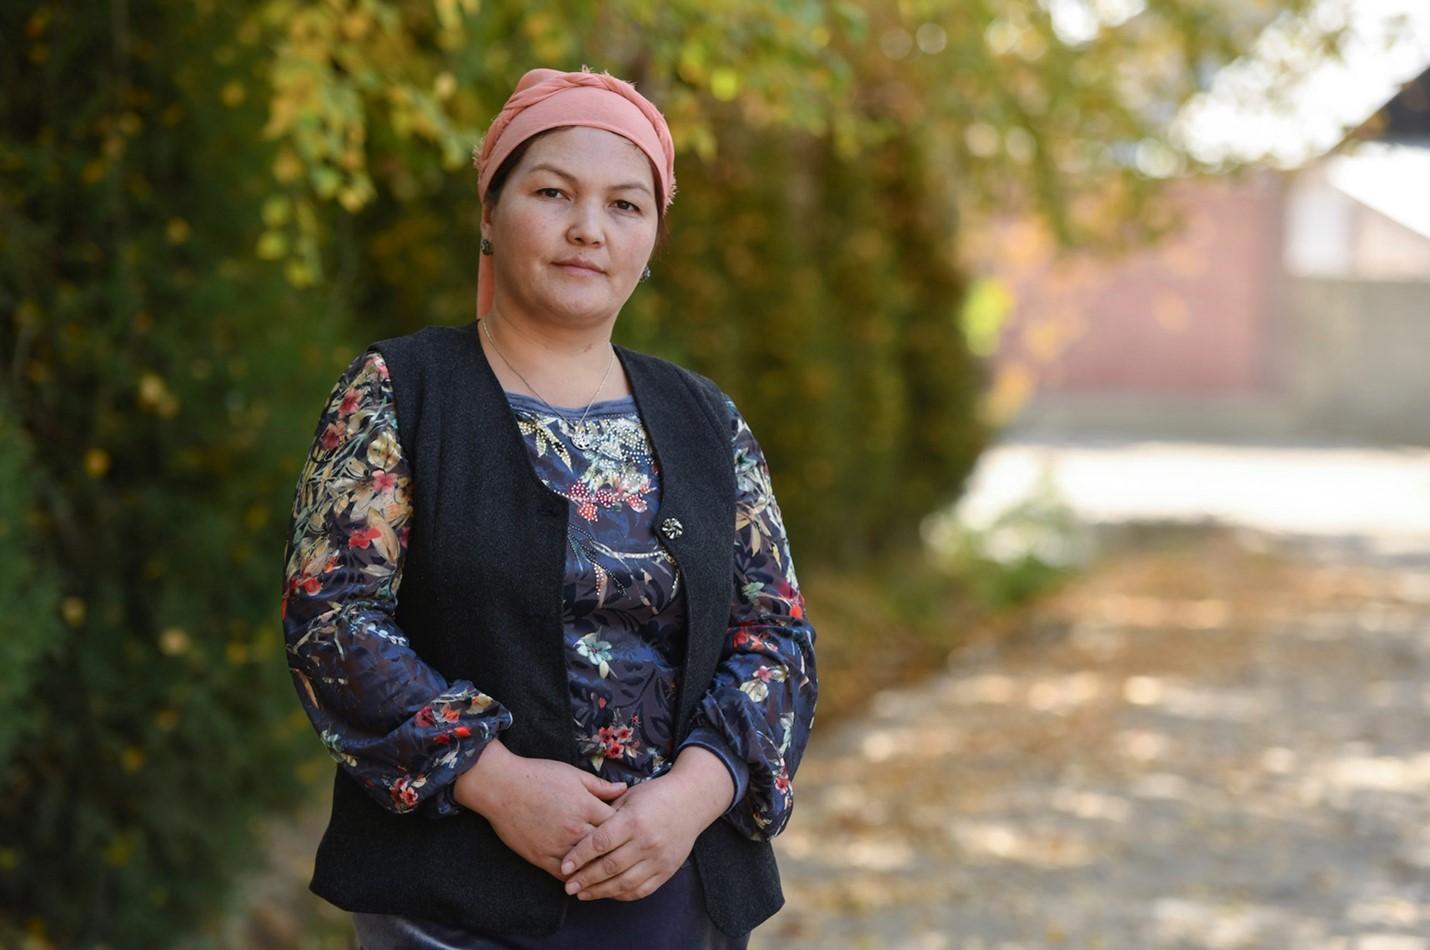 Ms. Nargiza Tabaldieva's photo